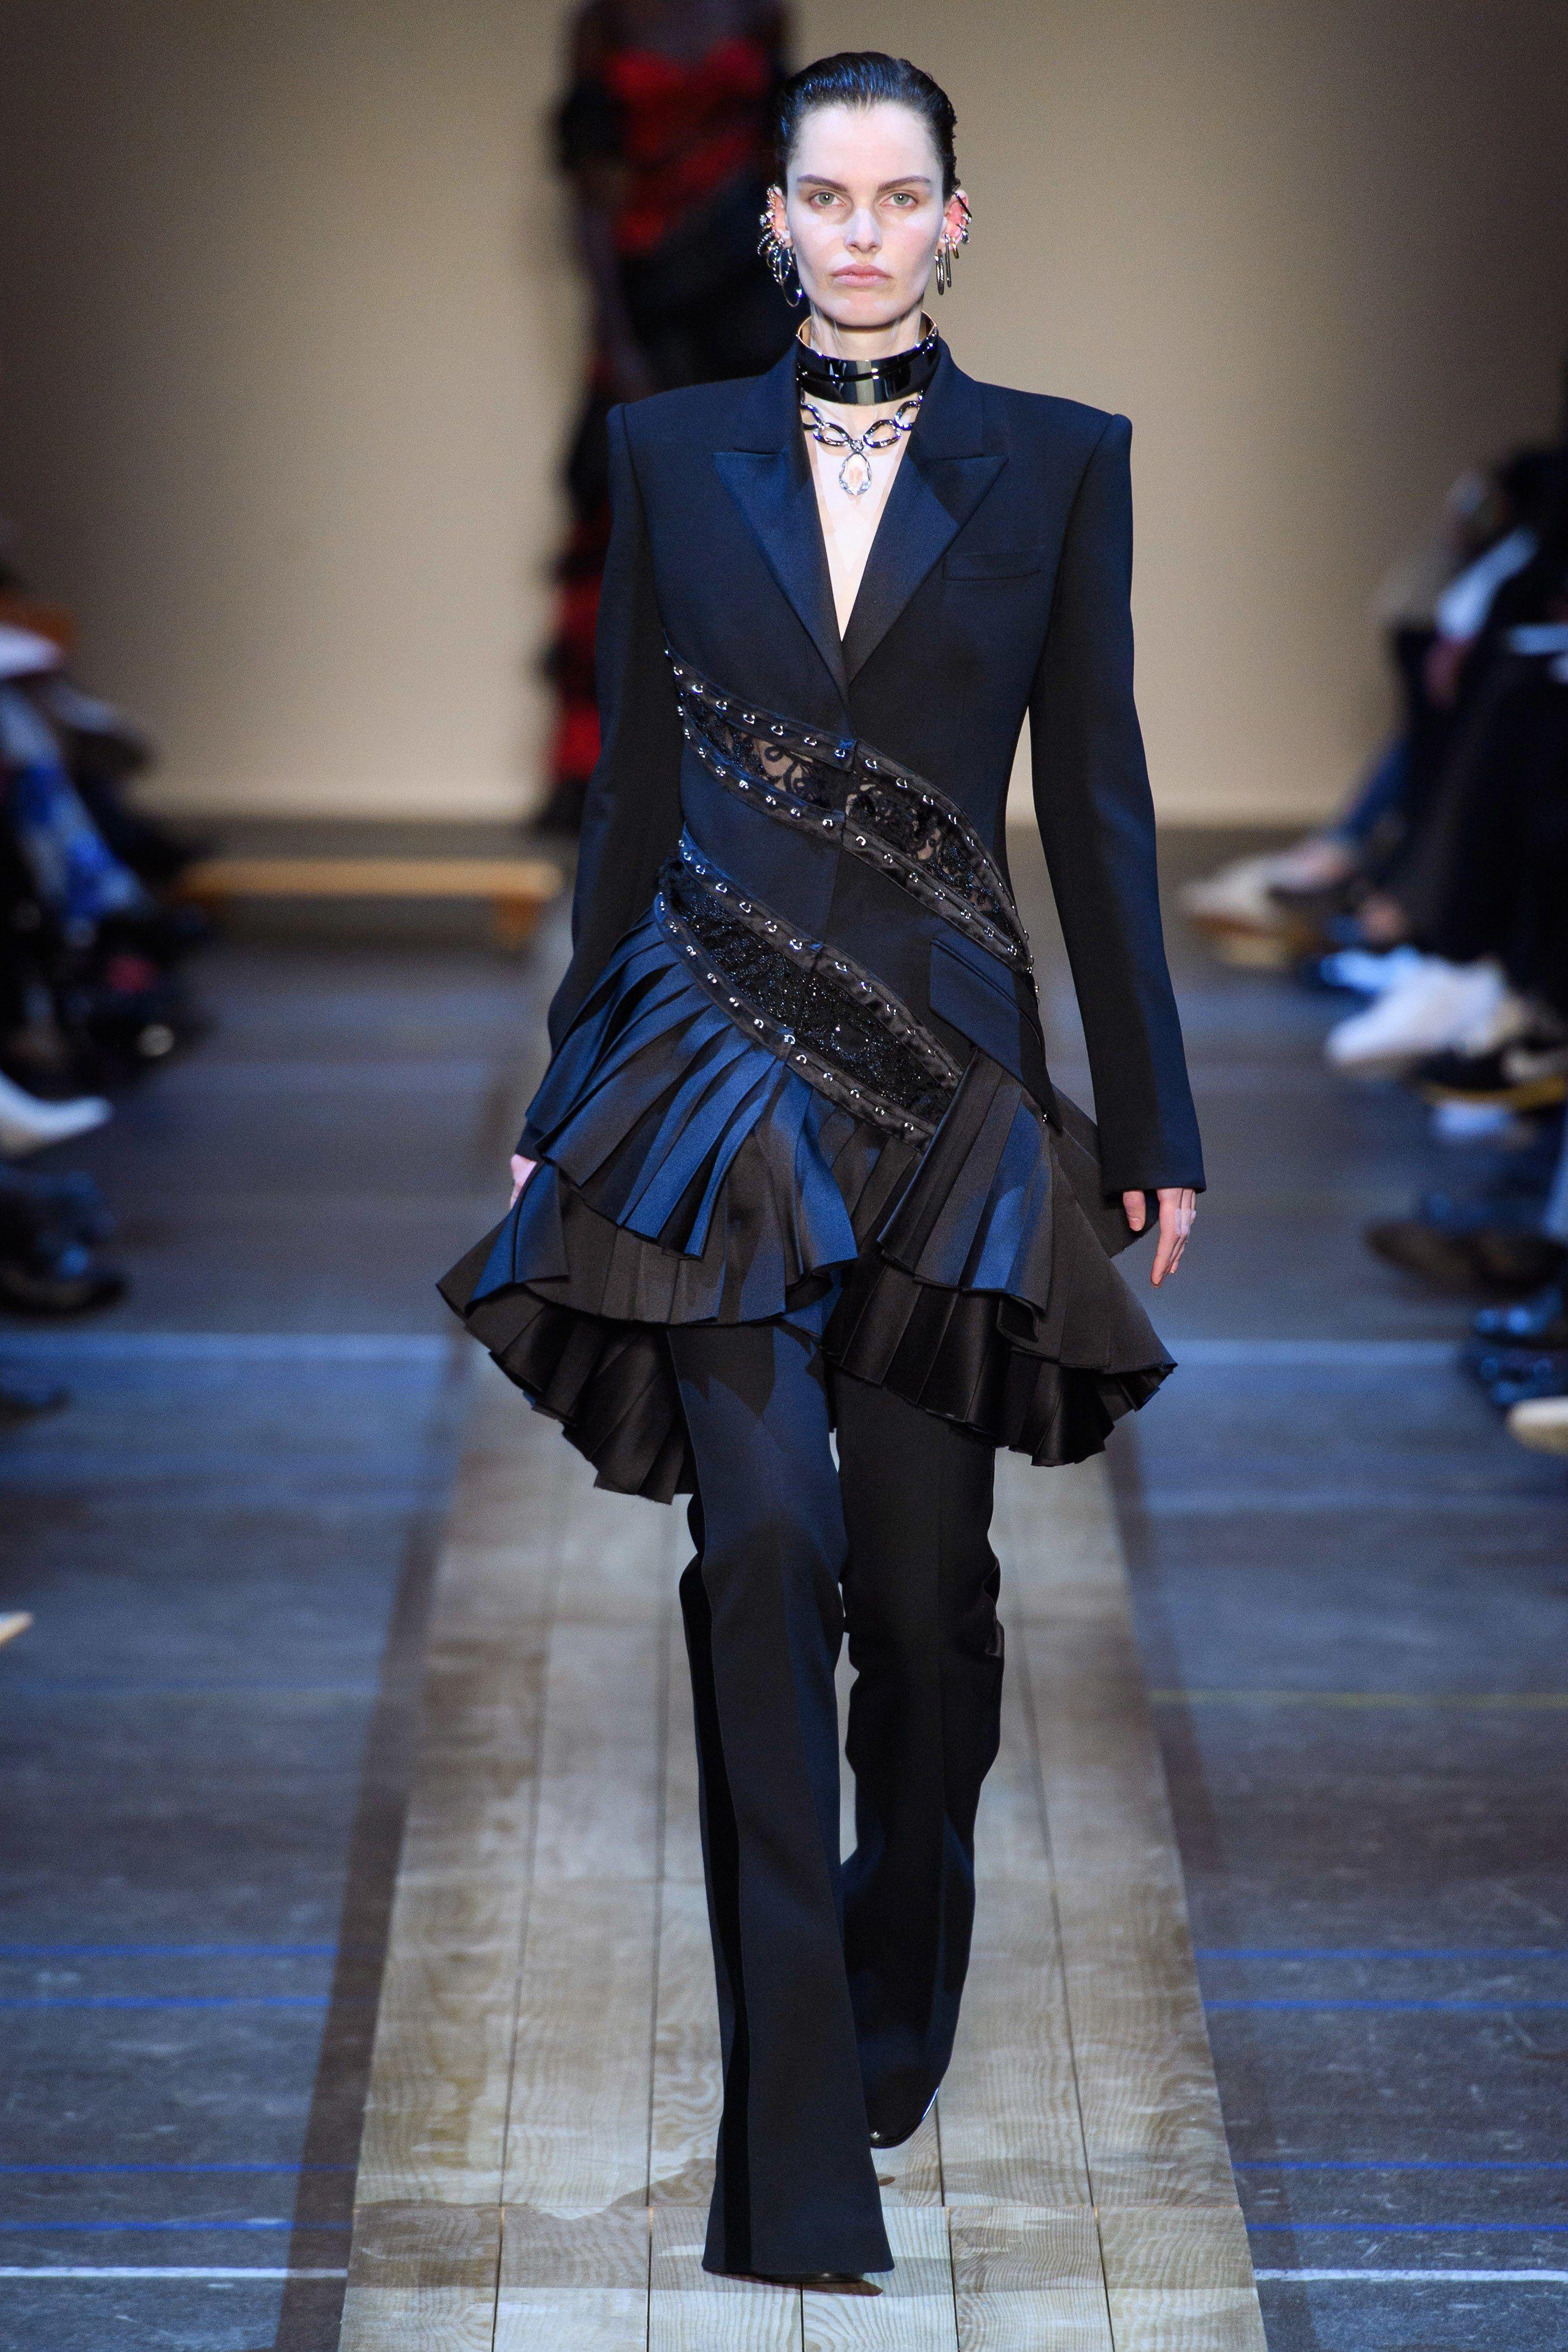 b71961f0bb Alexander McQueen Fall 2019 Ready-to-Wear Fashion Show in 2019 ...